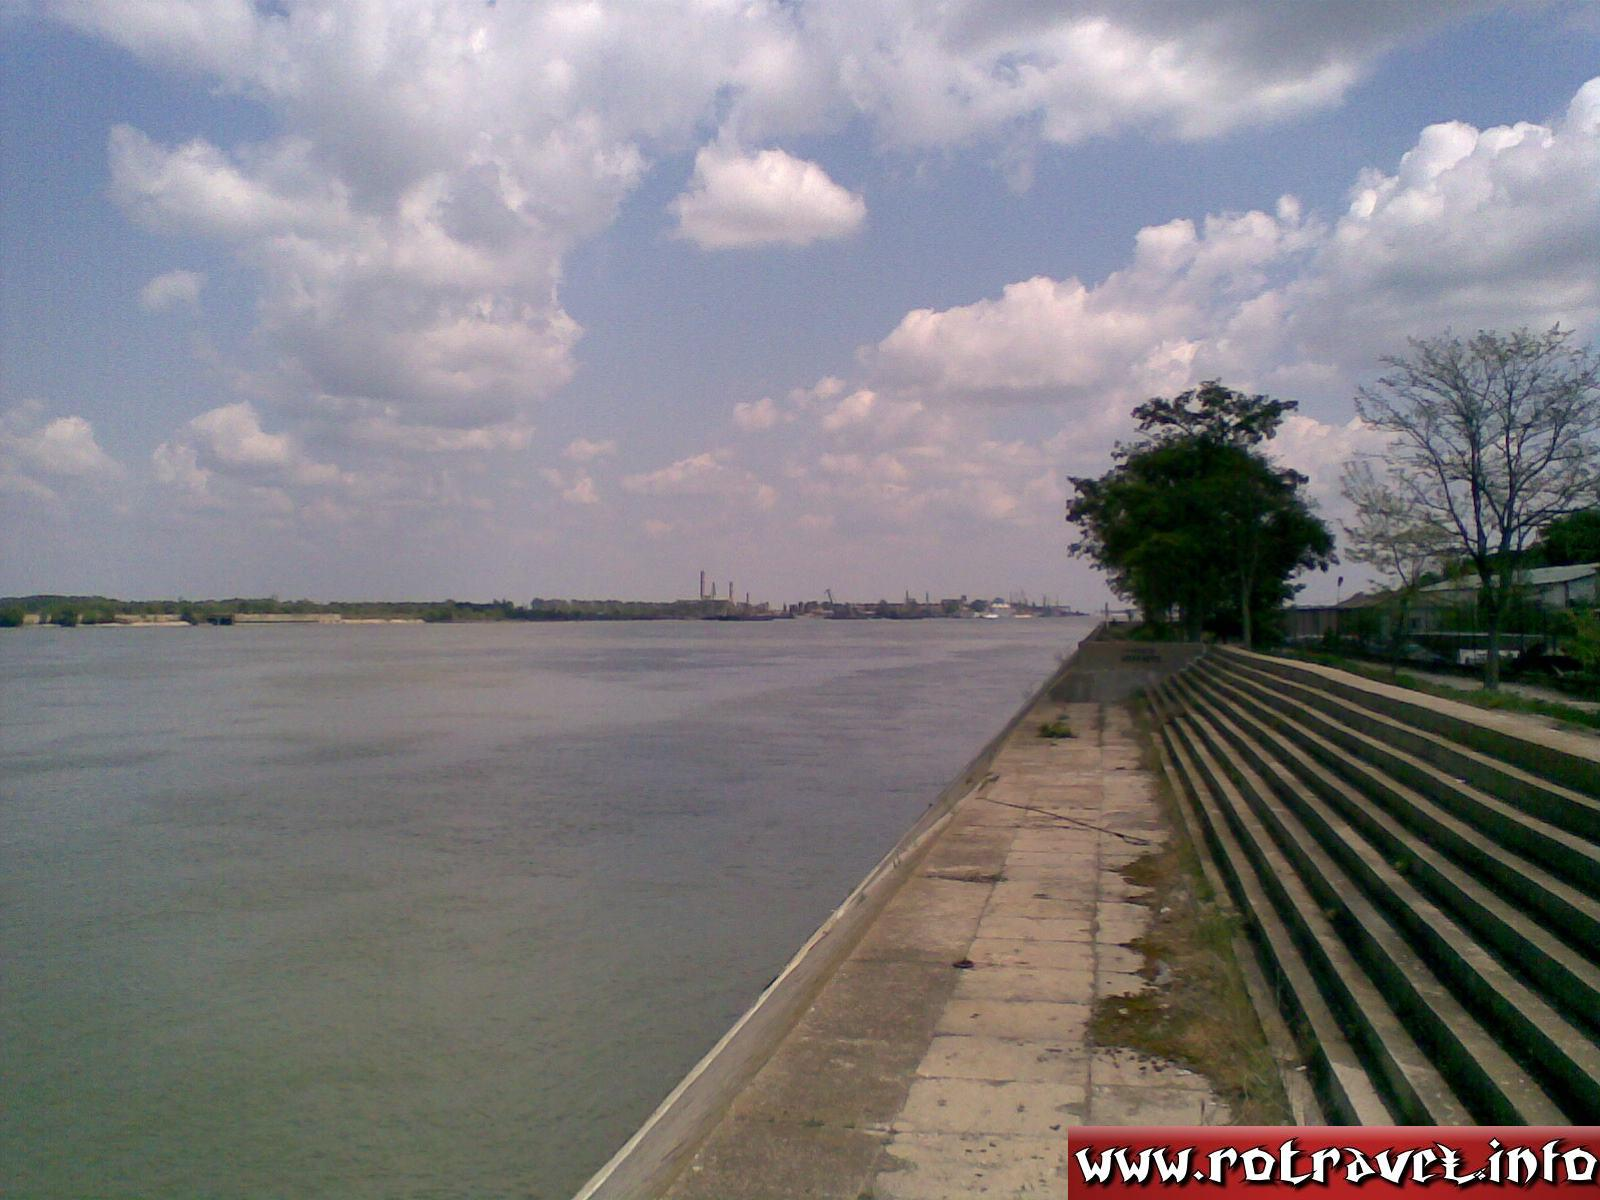 The Danube (Dunav in Bulgarian)